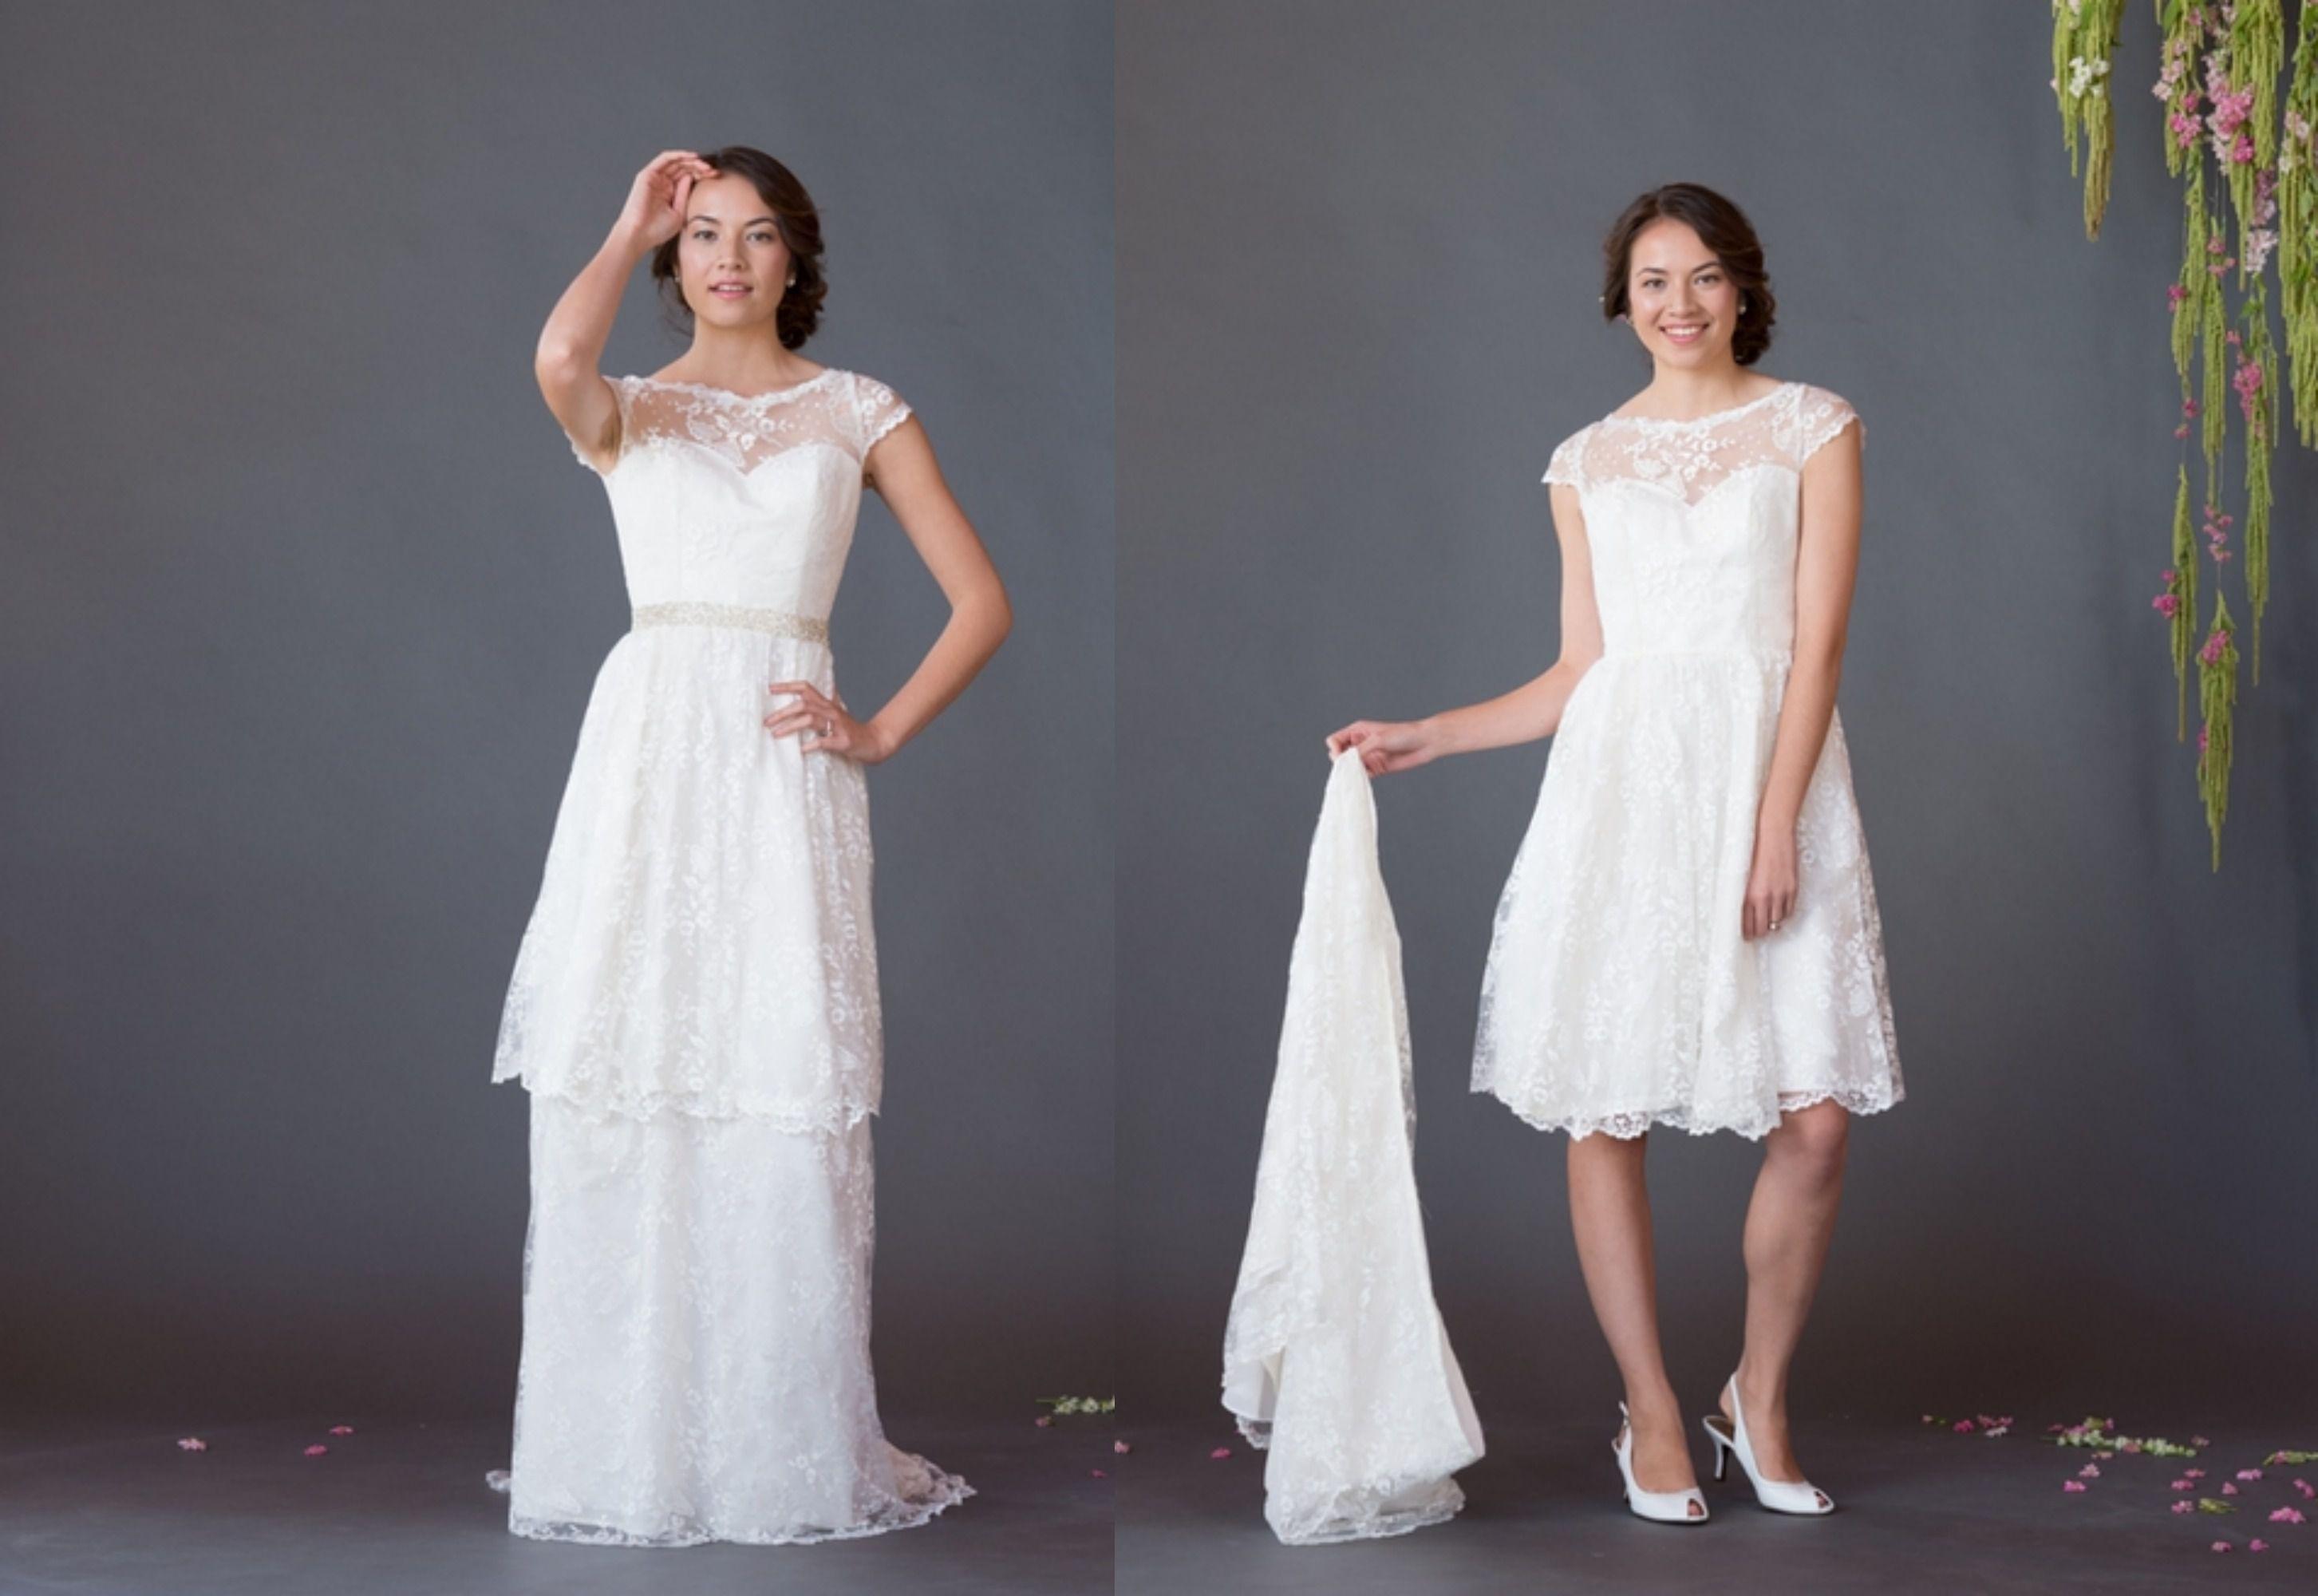 Eco-friendly And Fair Trade Wedding Dress - Rustic Wedding Chic